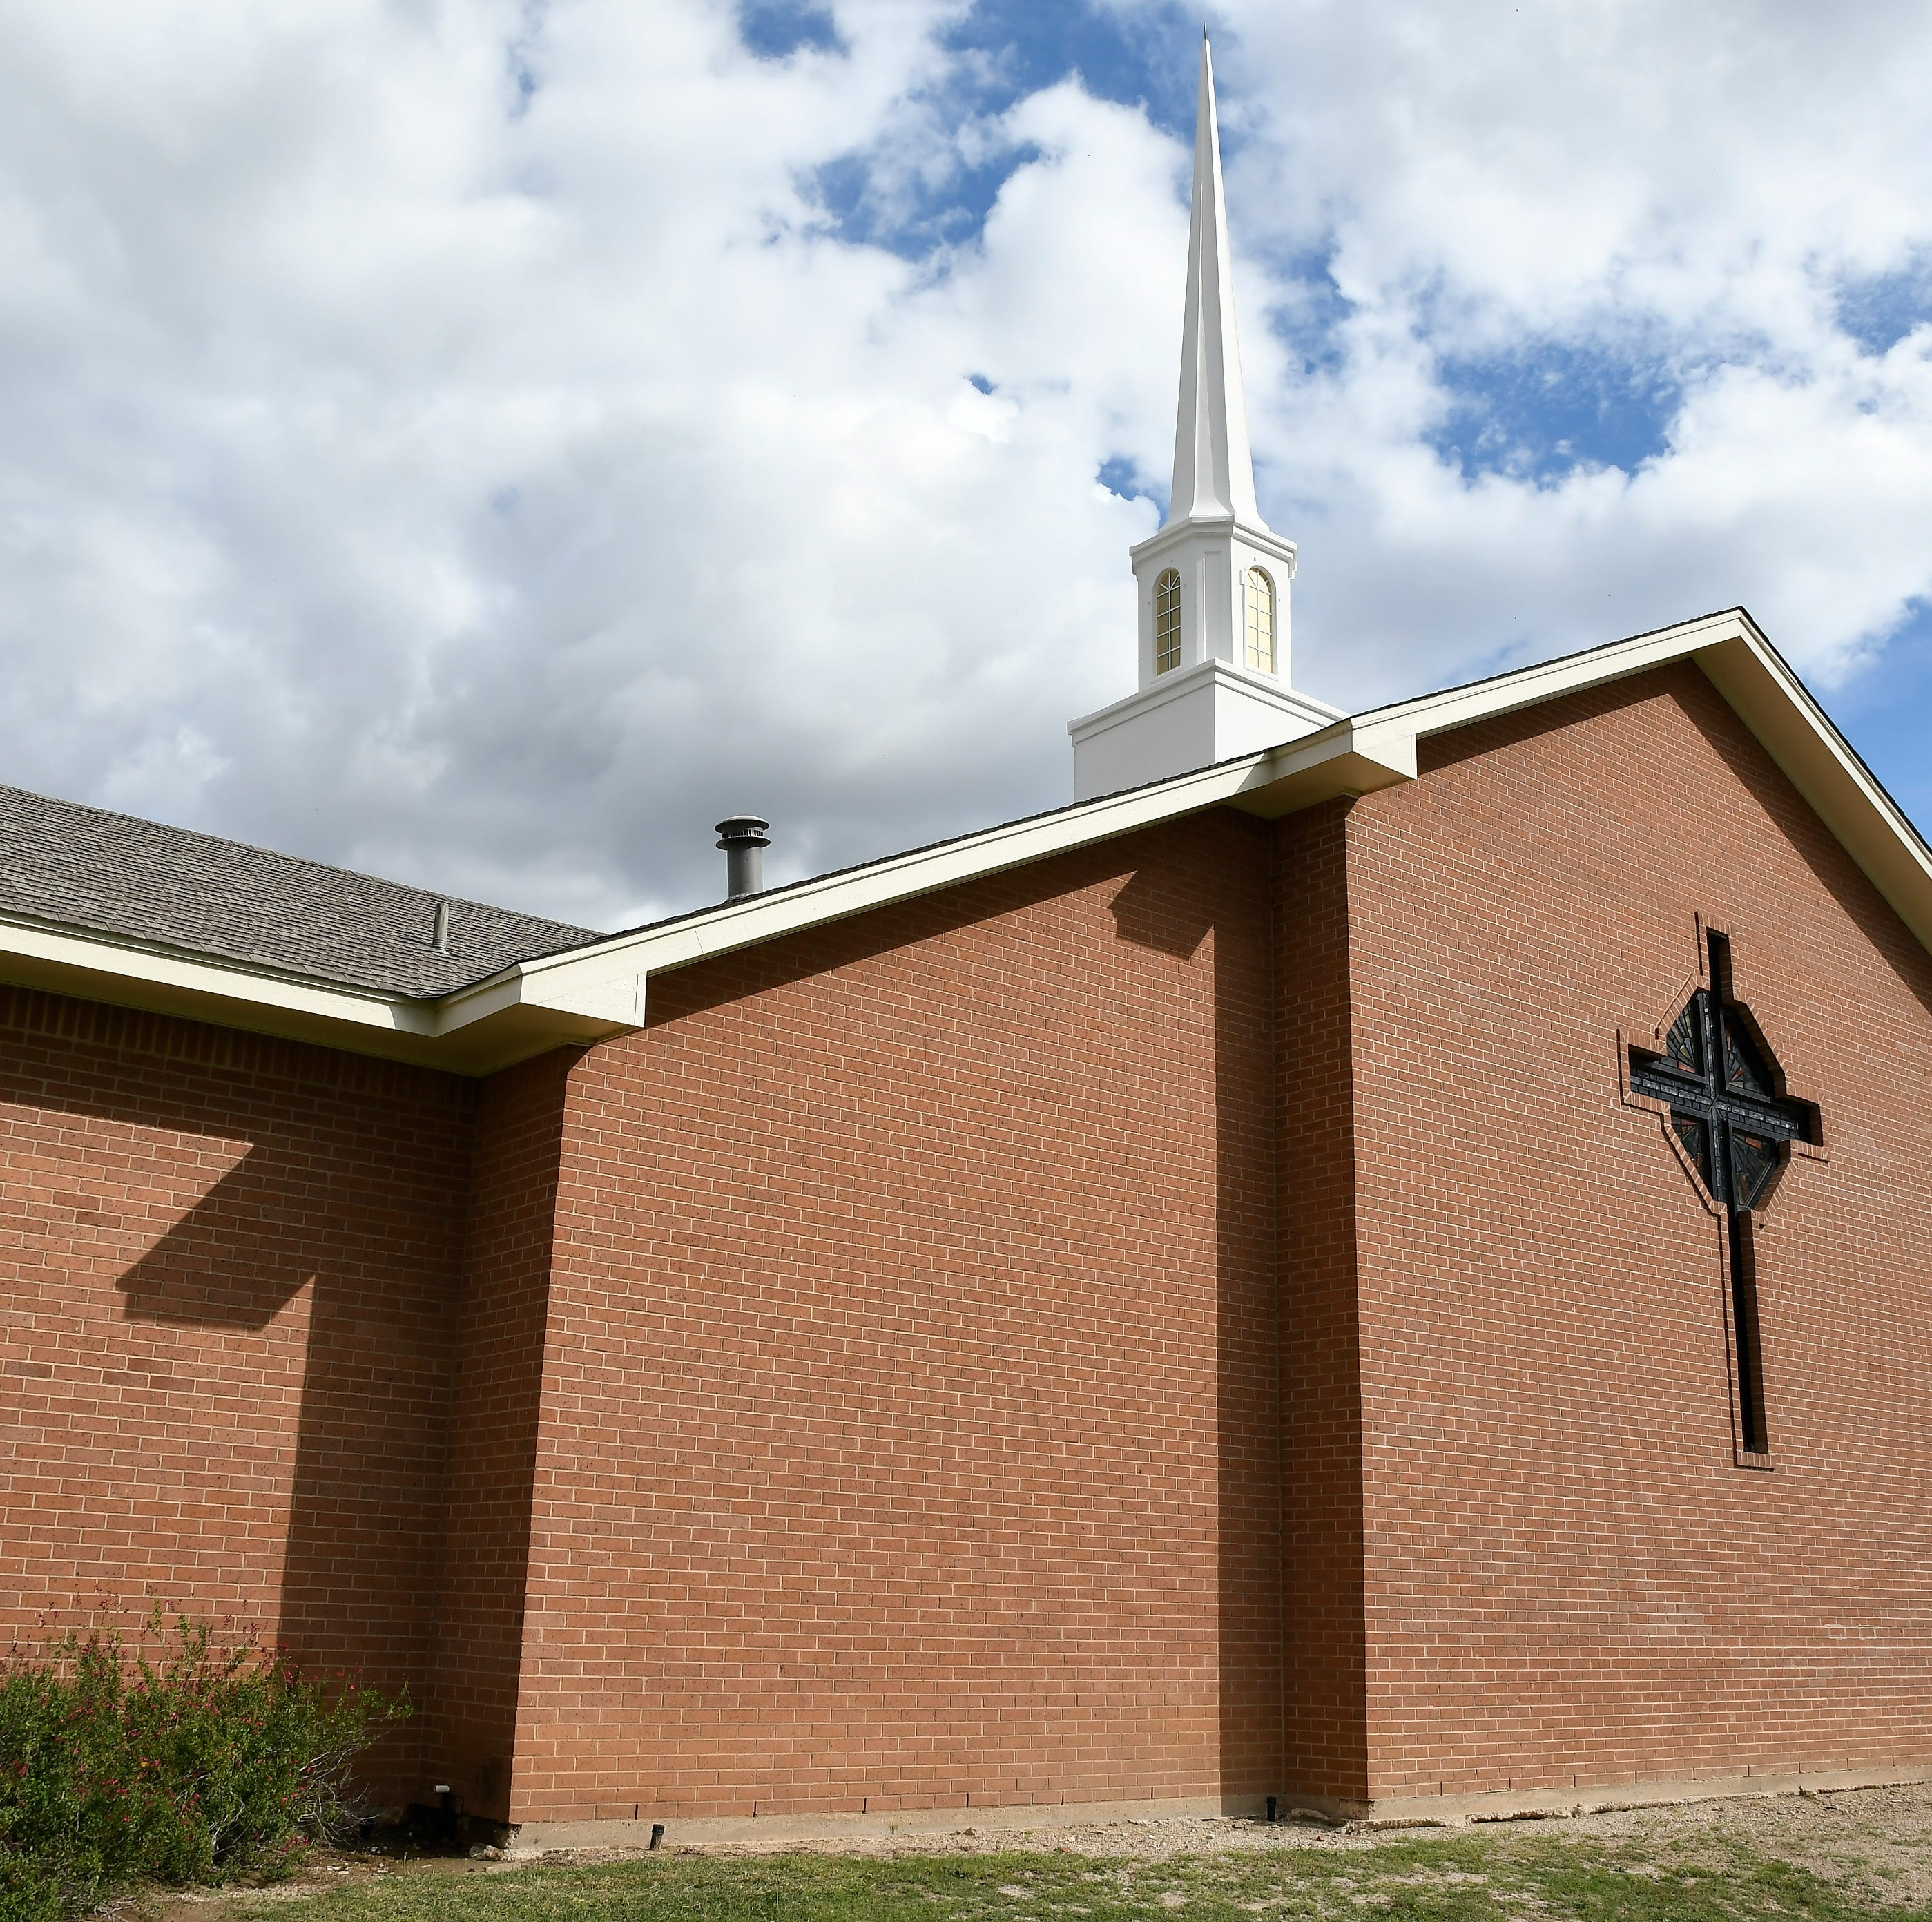 Belmore Baptist has served East San Angelo since 1951